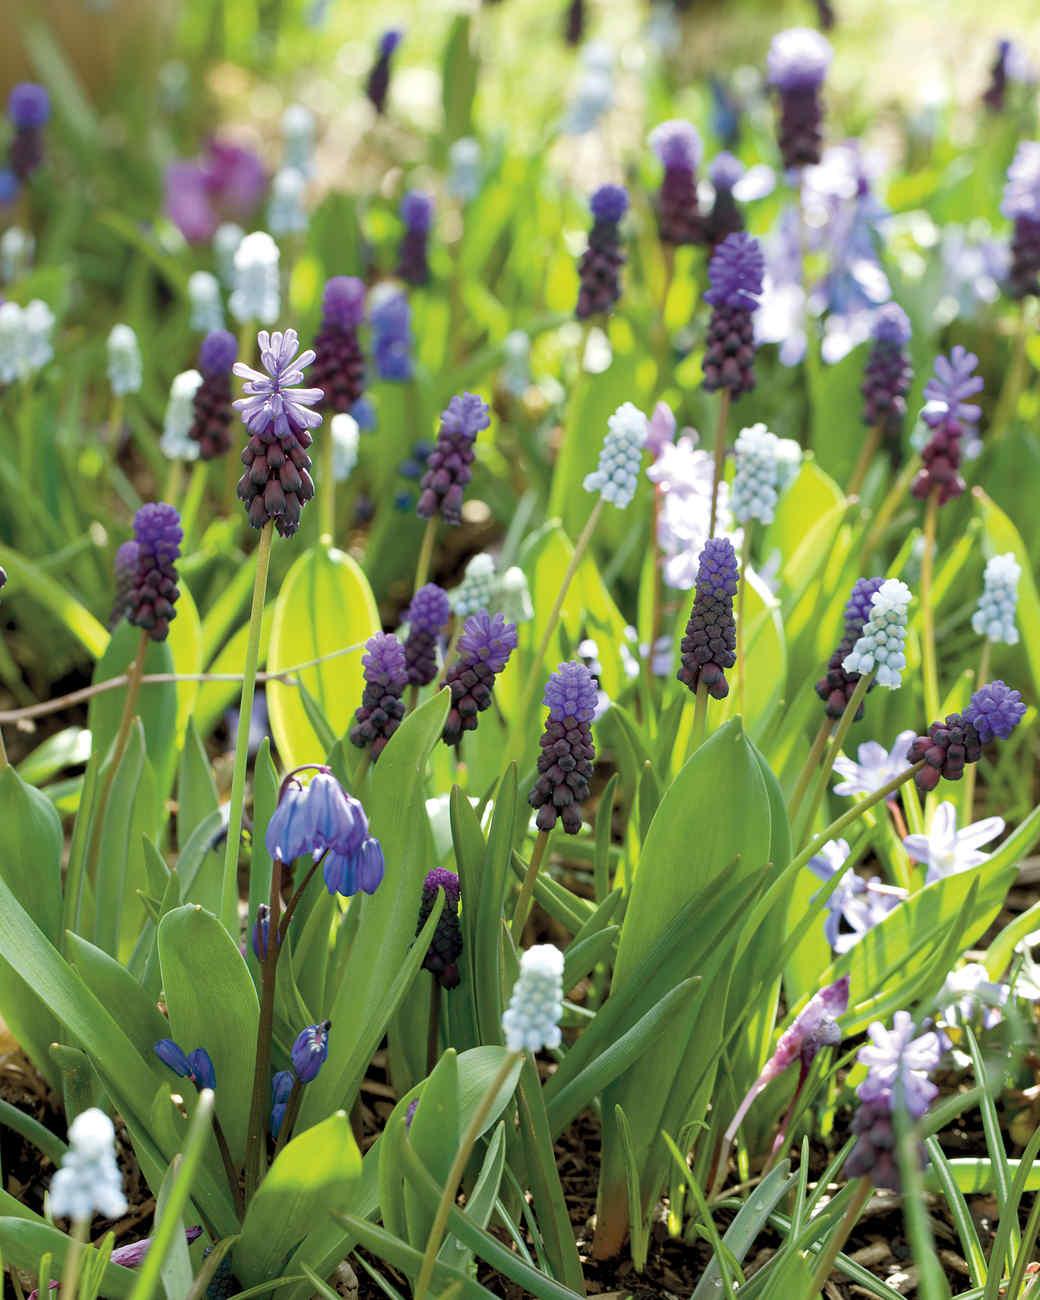 blue-bulbs-0911-mld107428.jpg